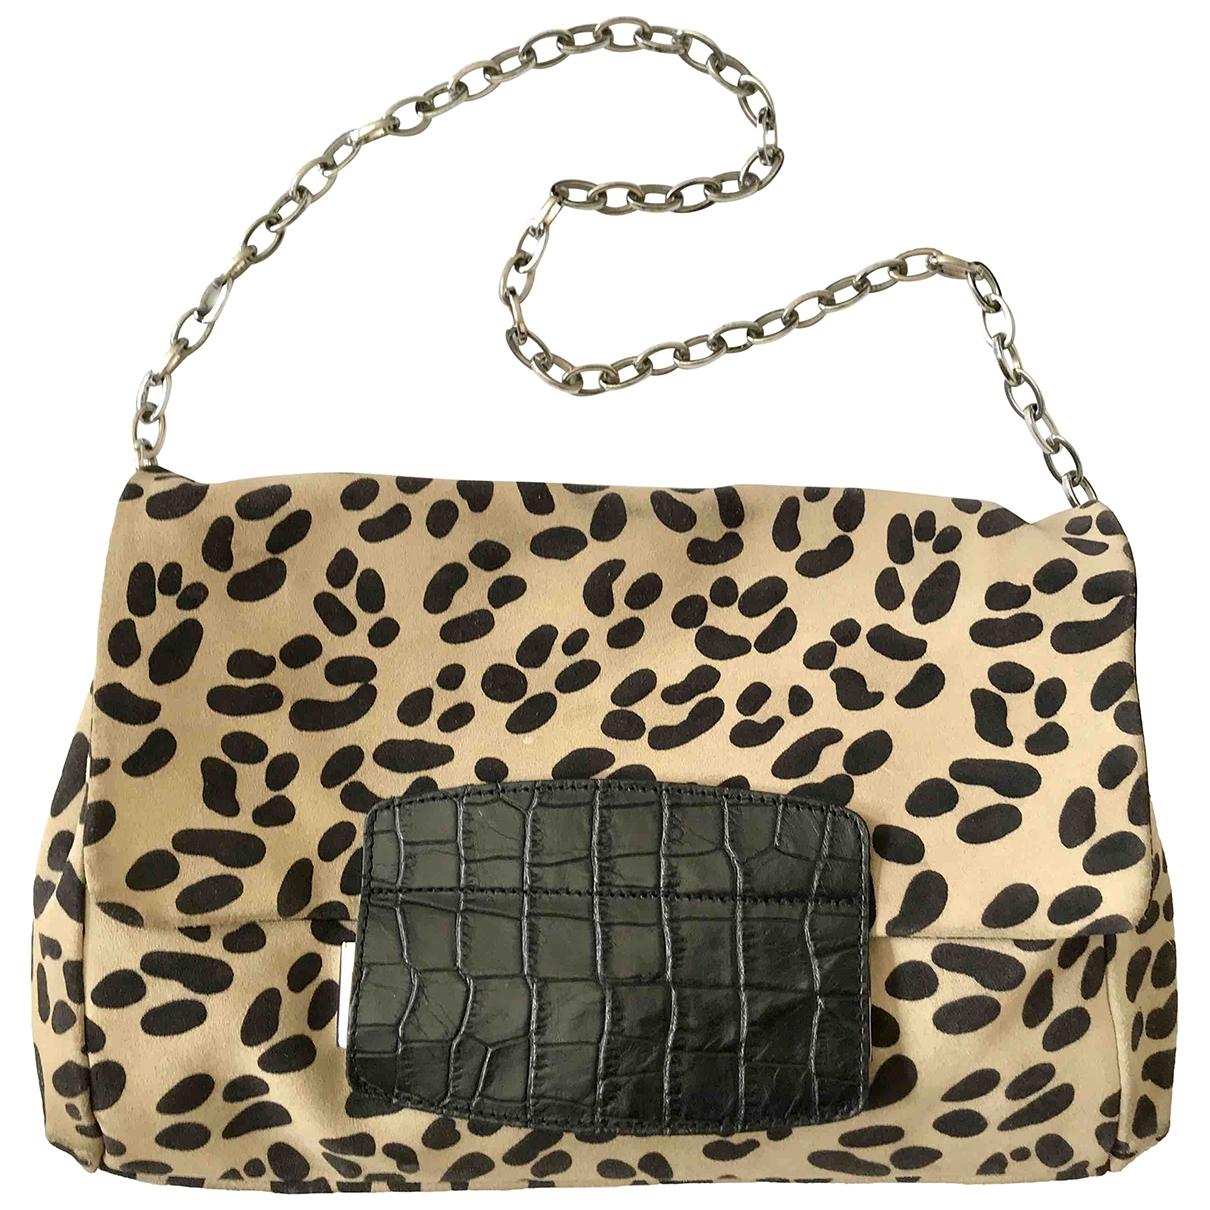 Jimmy Choo For H&m \N Beige Leather handbag for Women \N